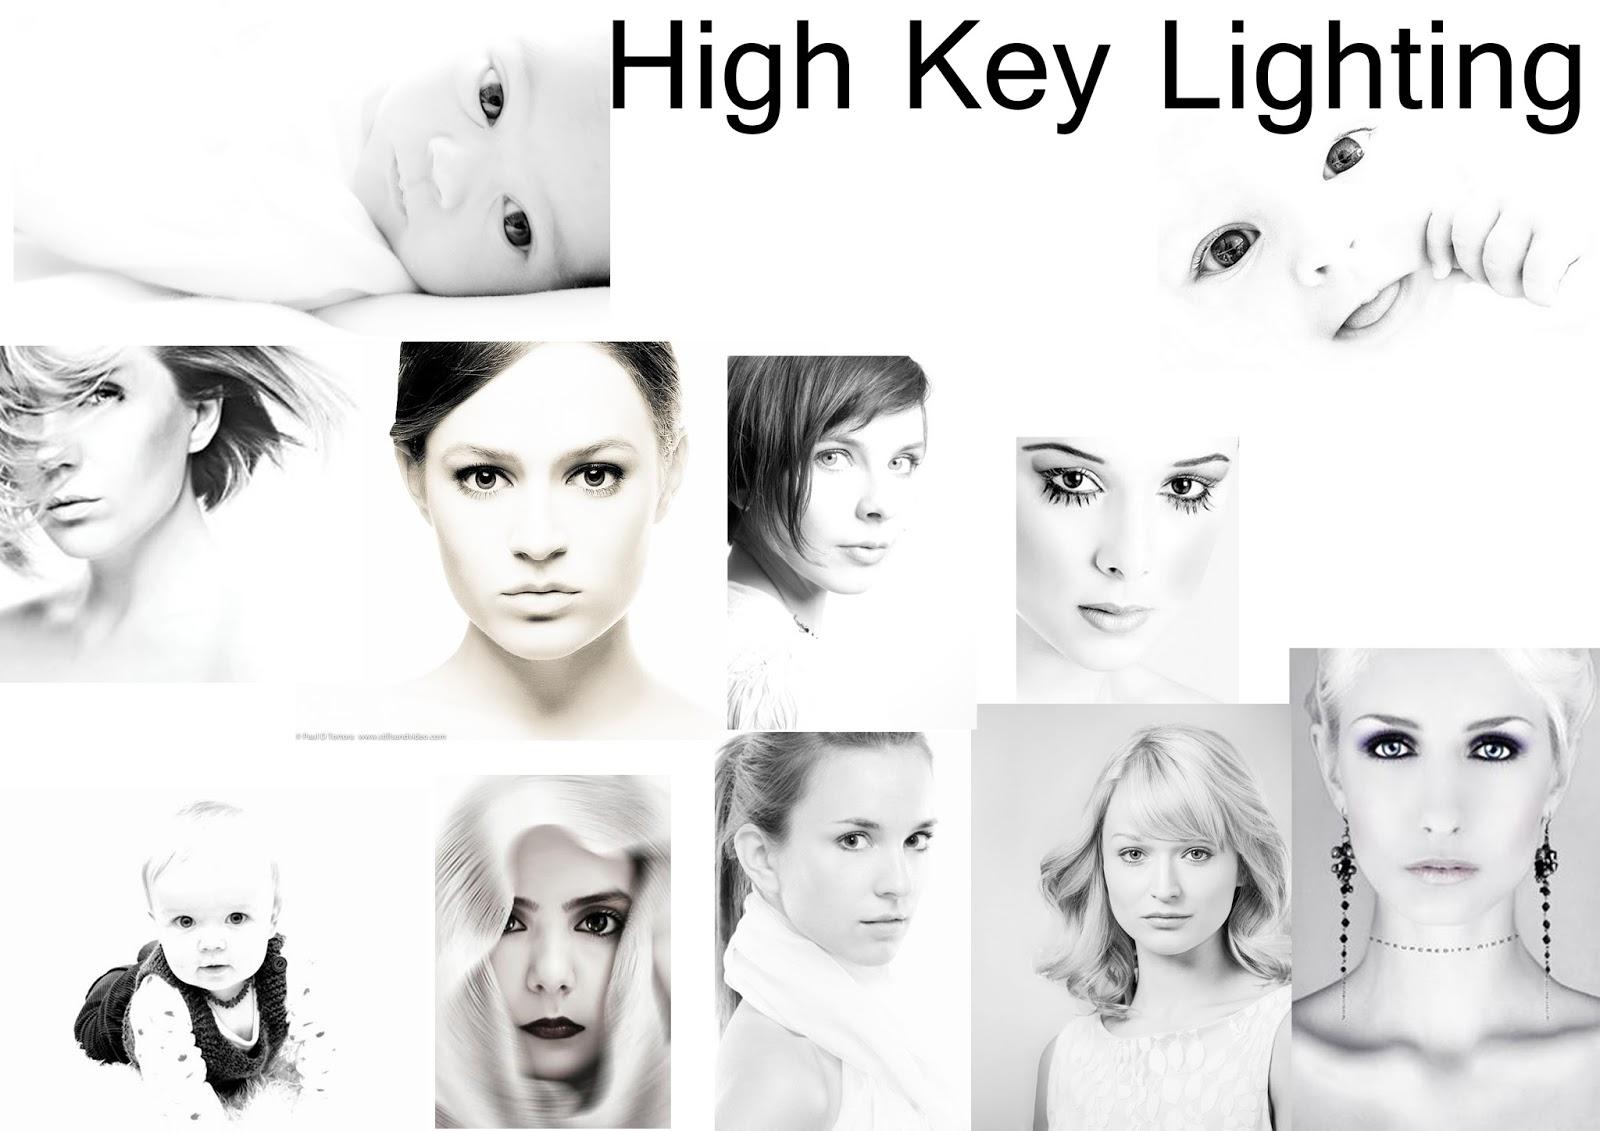 High Key Lighting Film | www.imgkid.com - The Image Kid ...